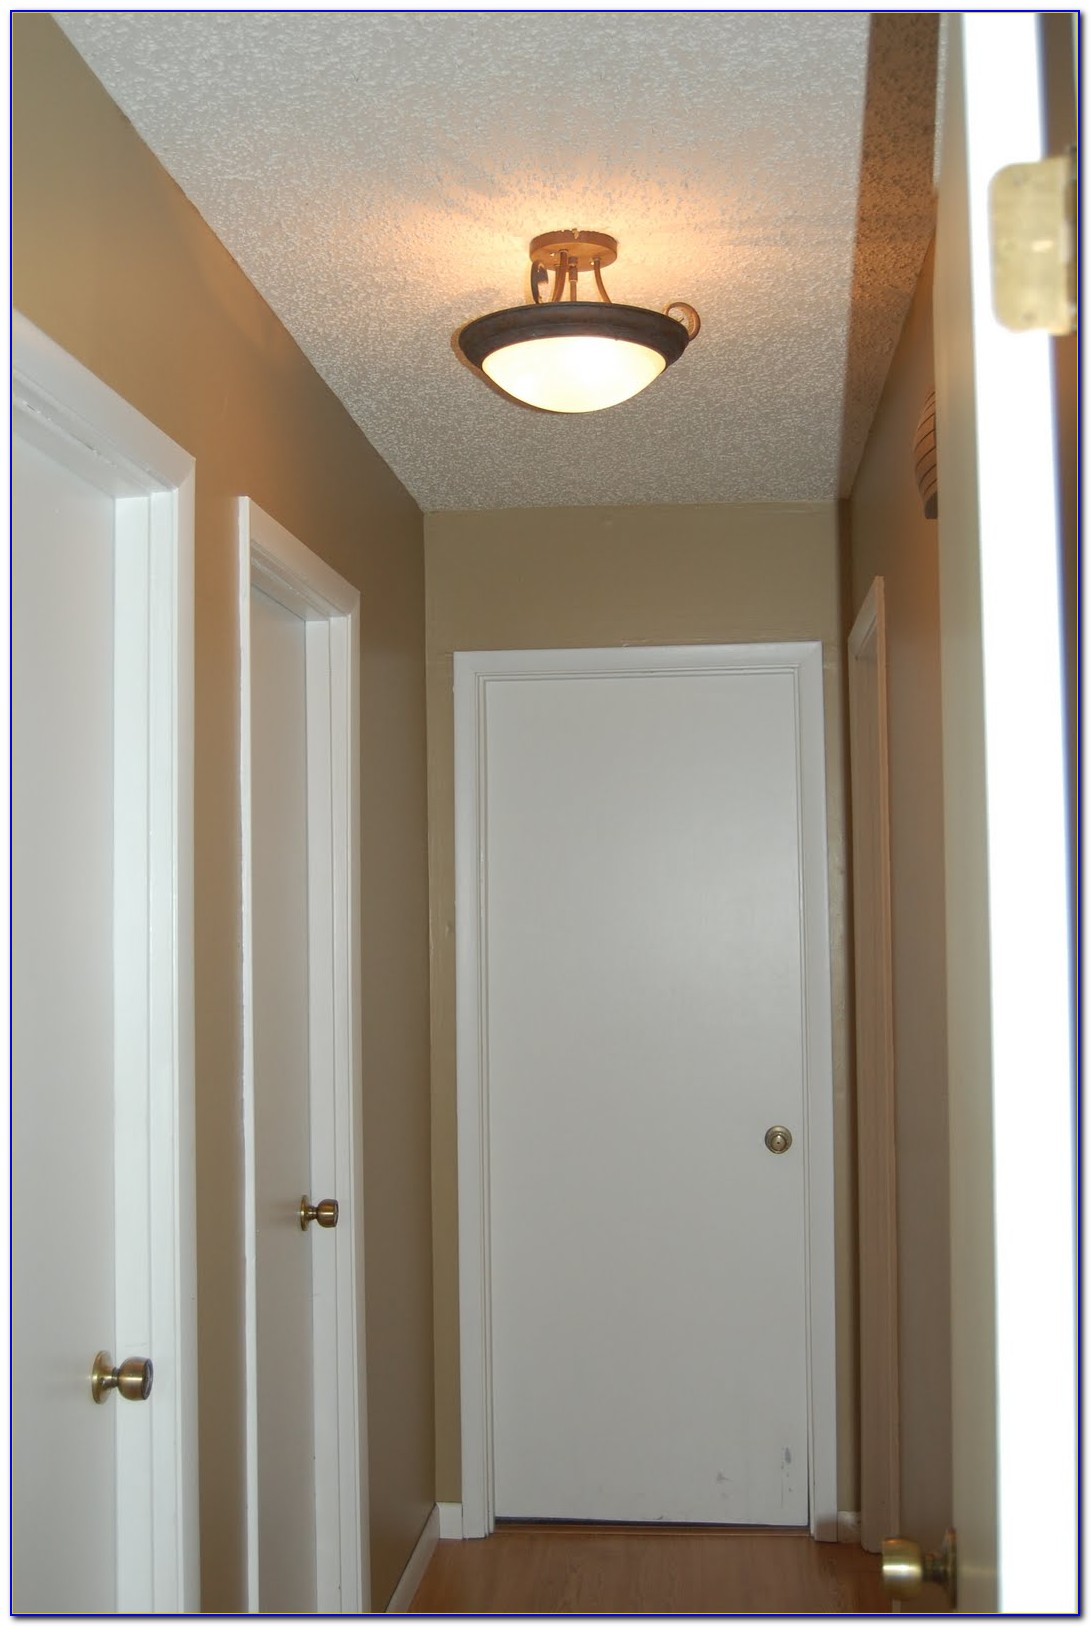 Ceiling Light Fixtures For Hallway